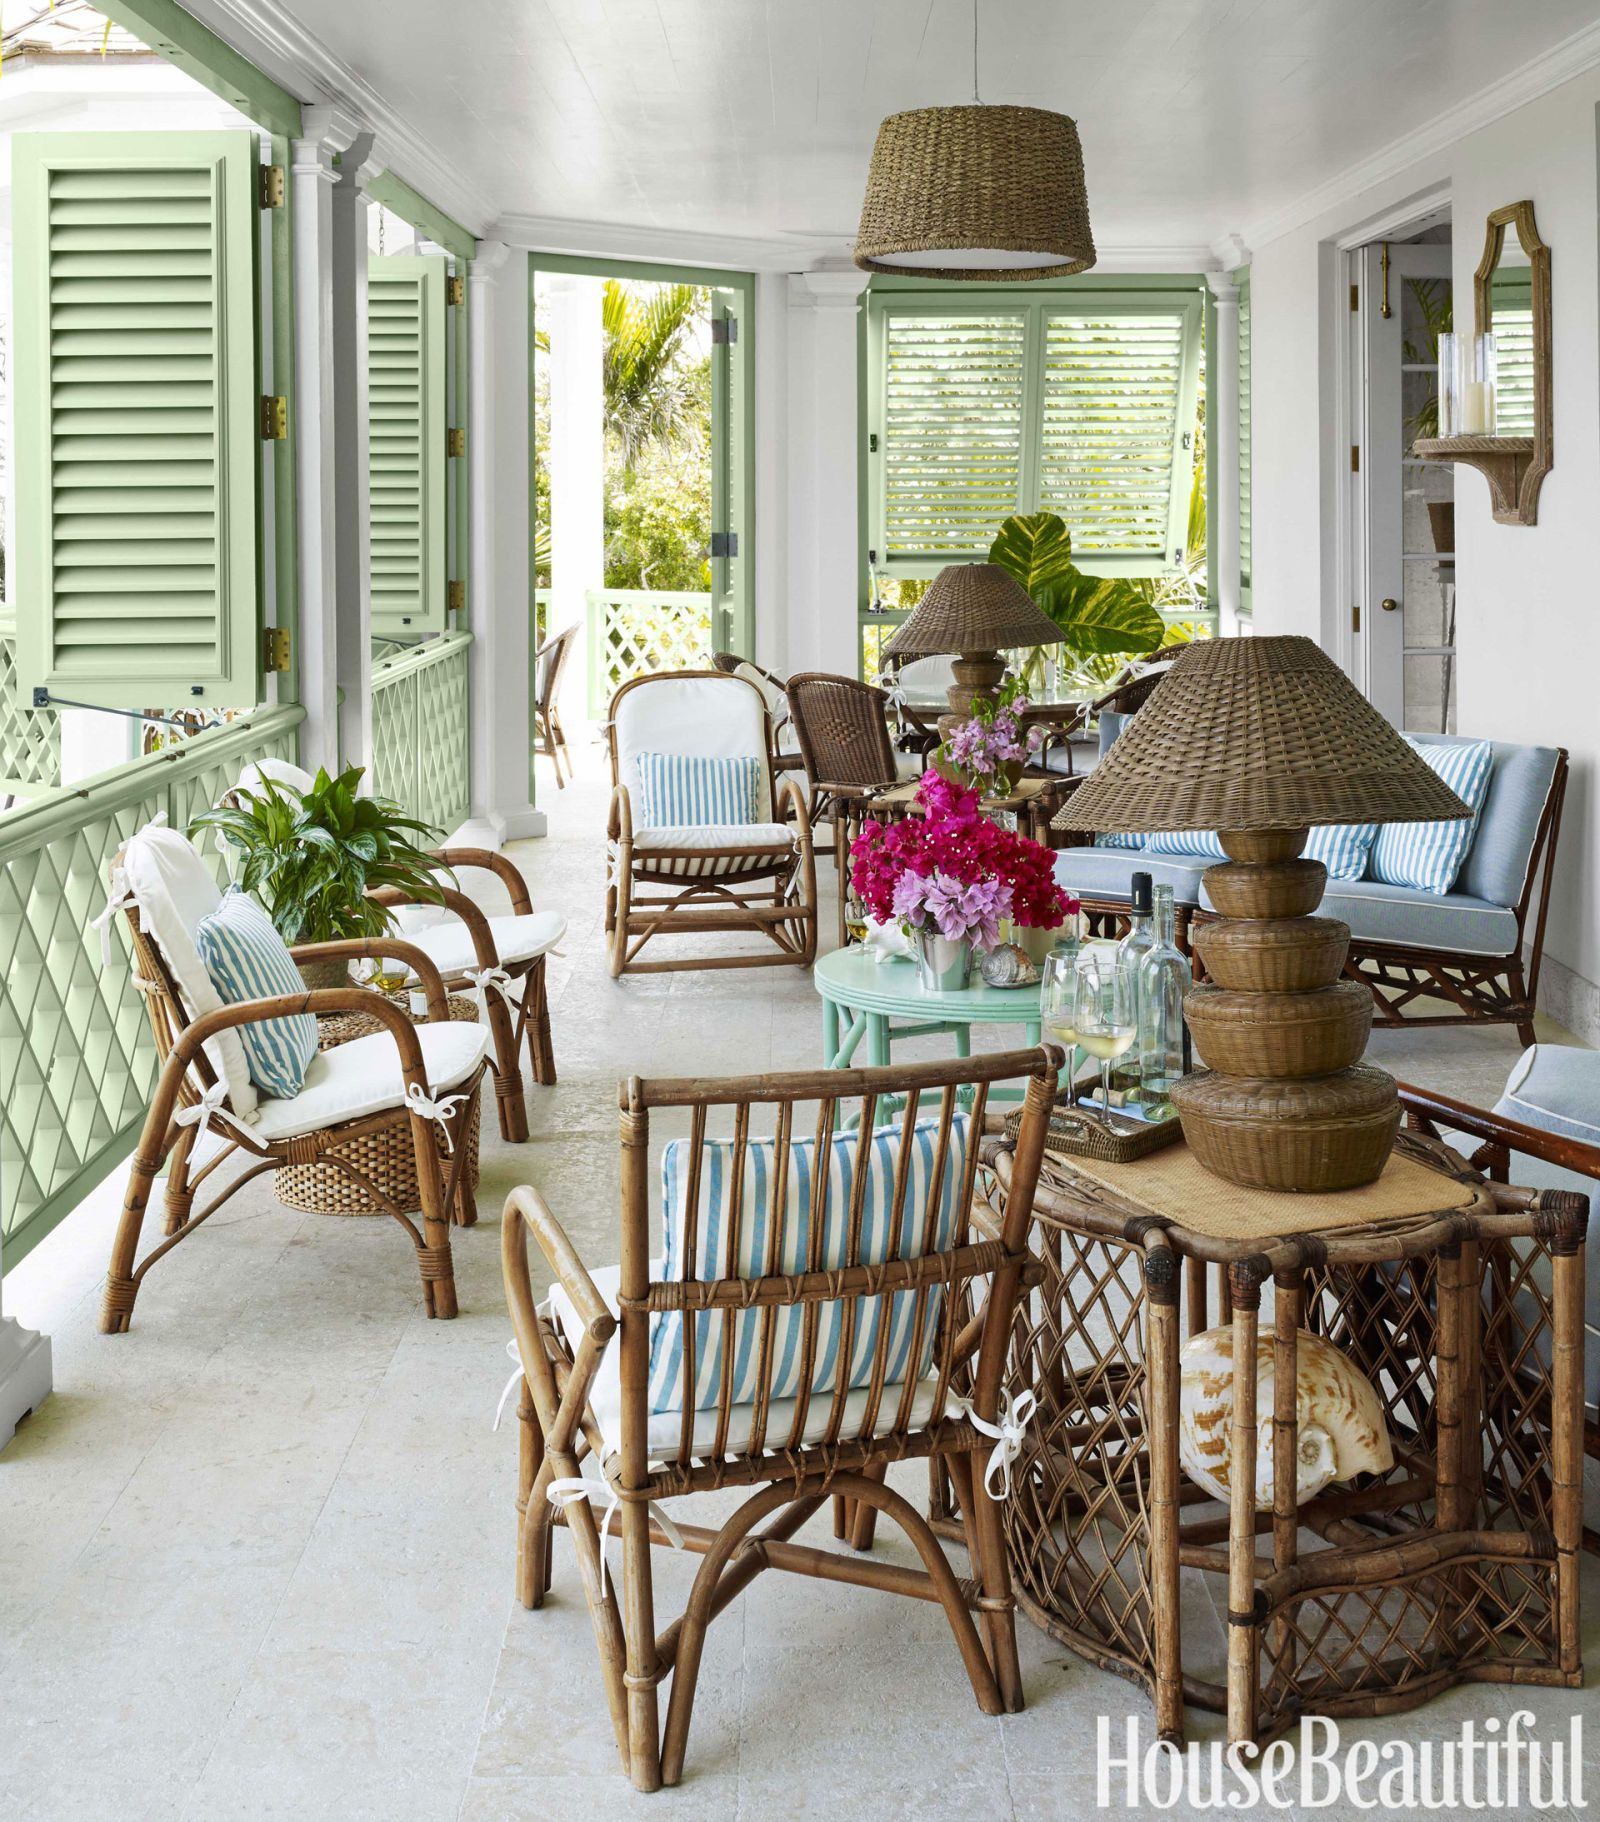 A Bright and Airy Bahamas House